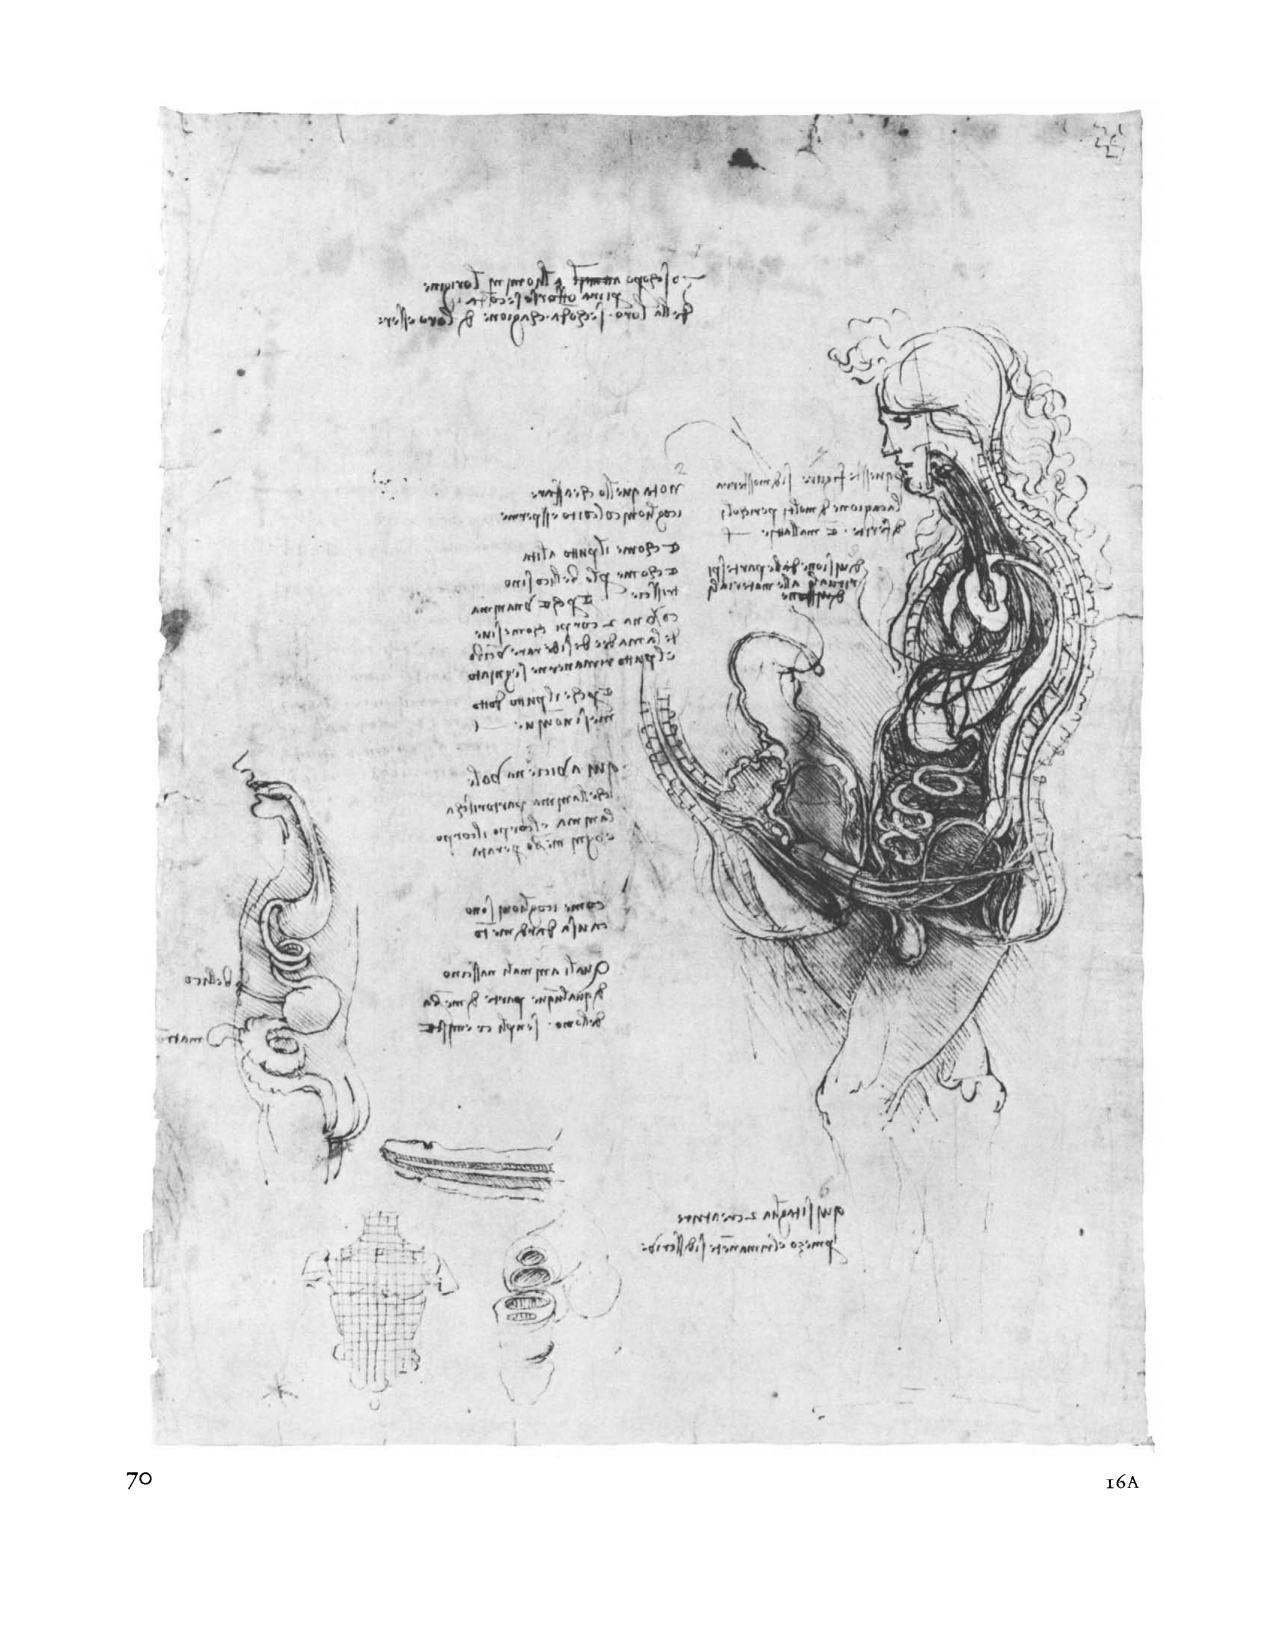 Da Vinci Catalogue of Drawings | November 2019 Notes from